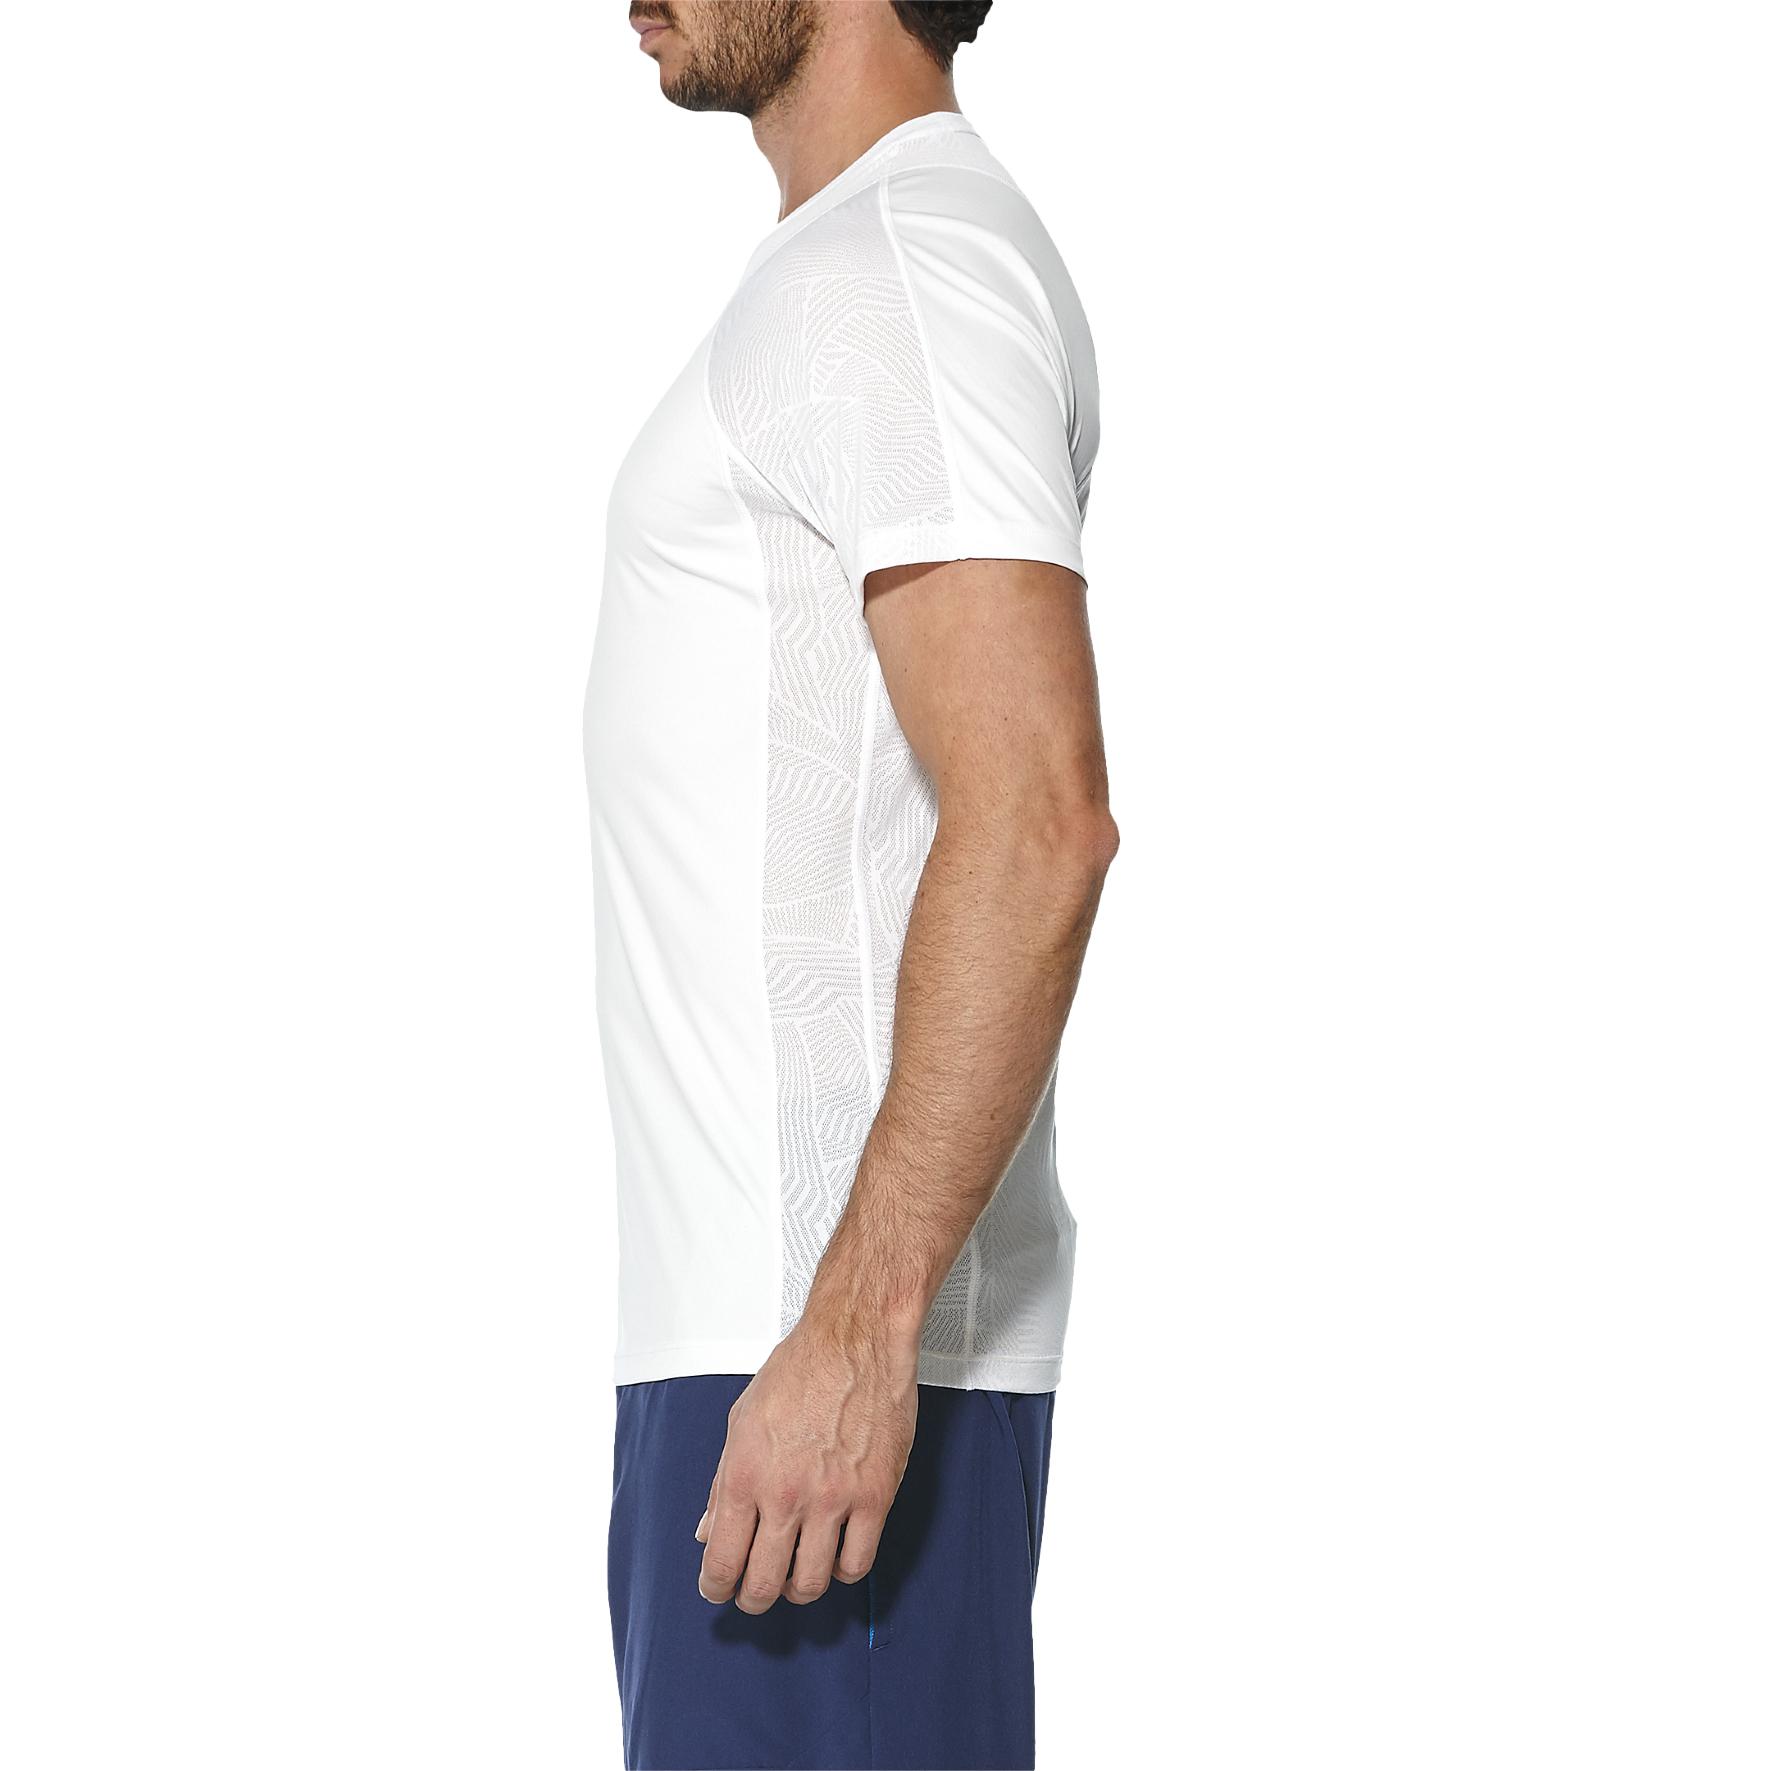 Asics Athlete Cooling Mens Tennis T-Shirt - White, XXL